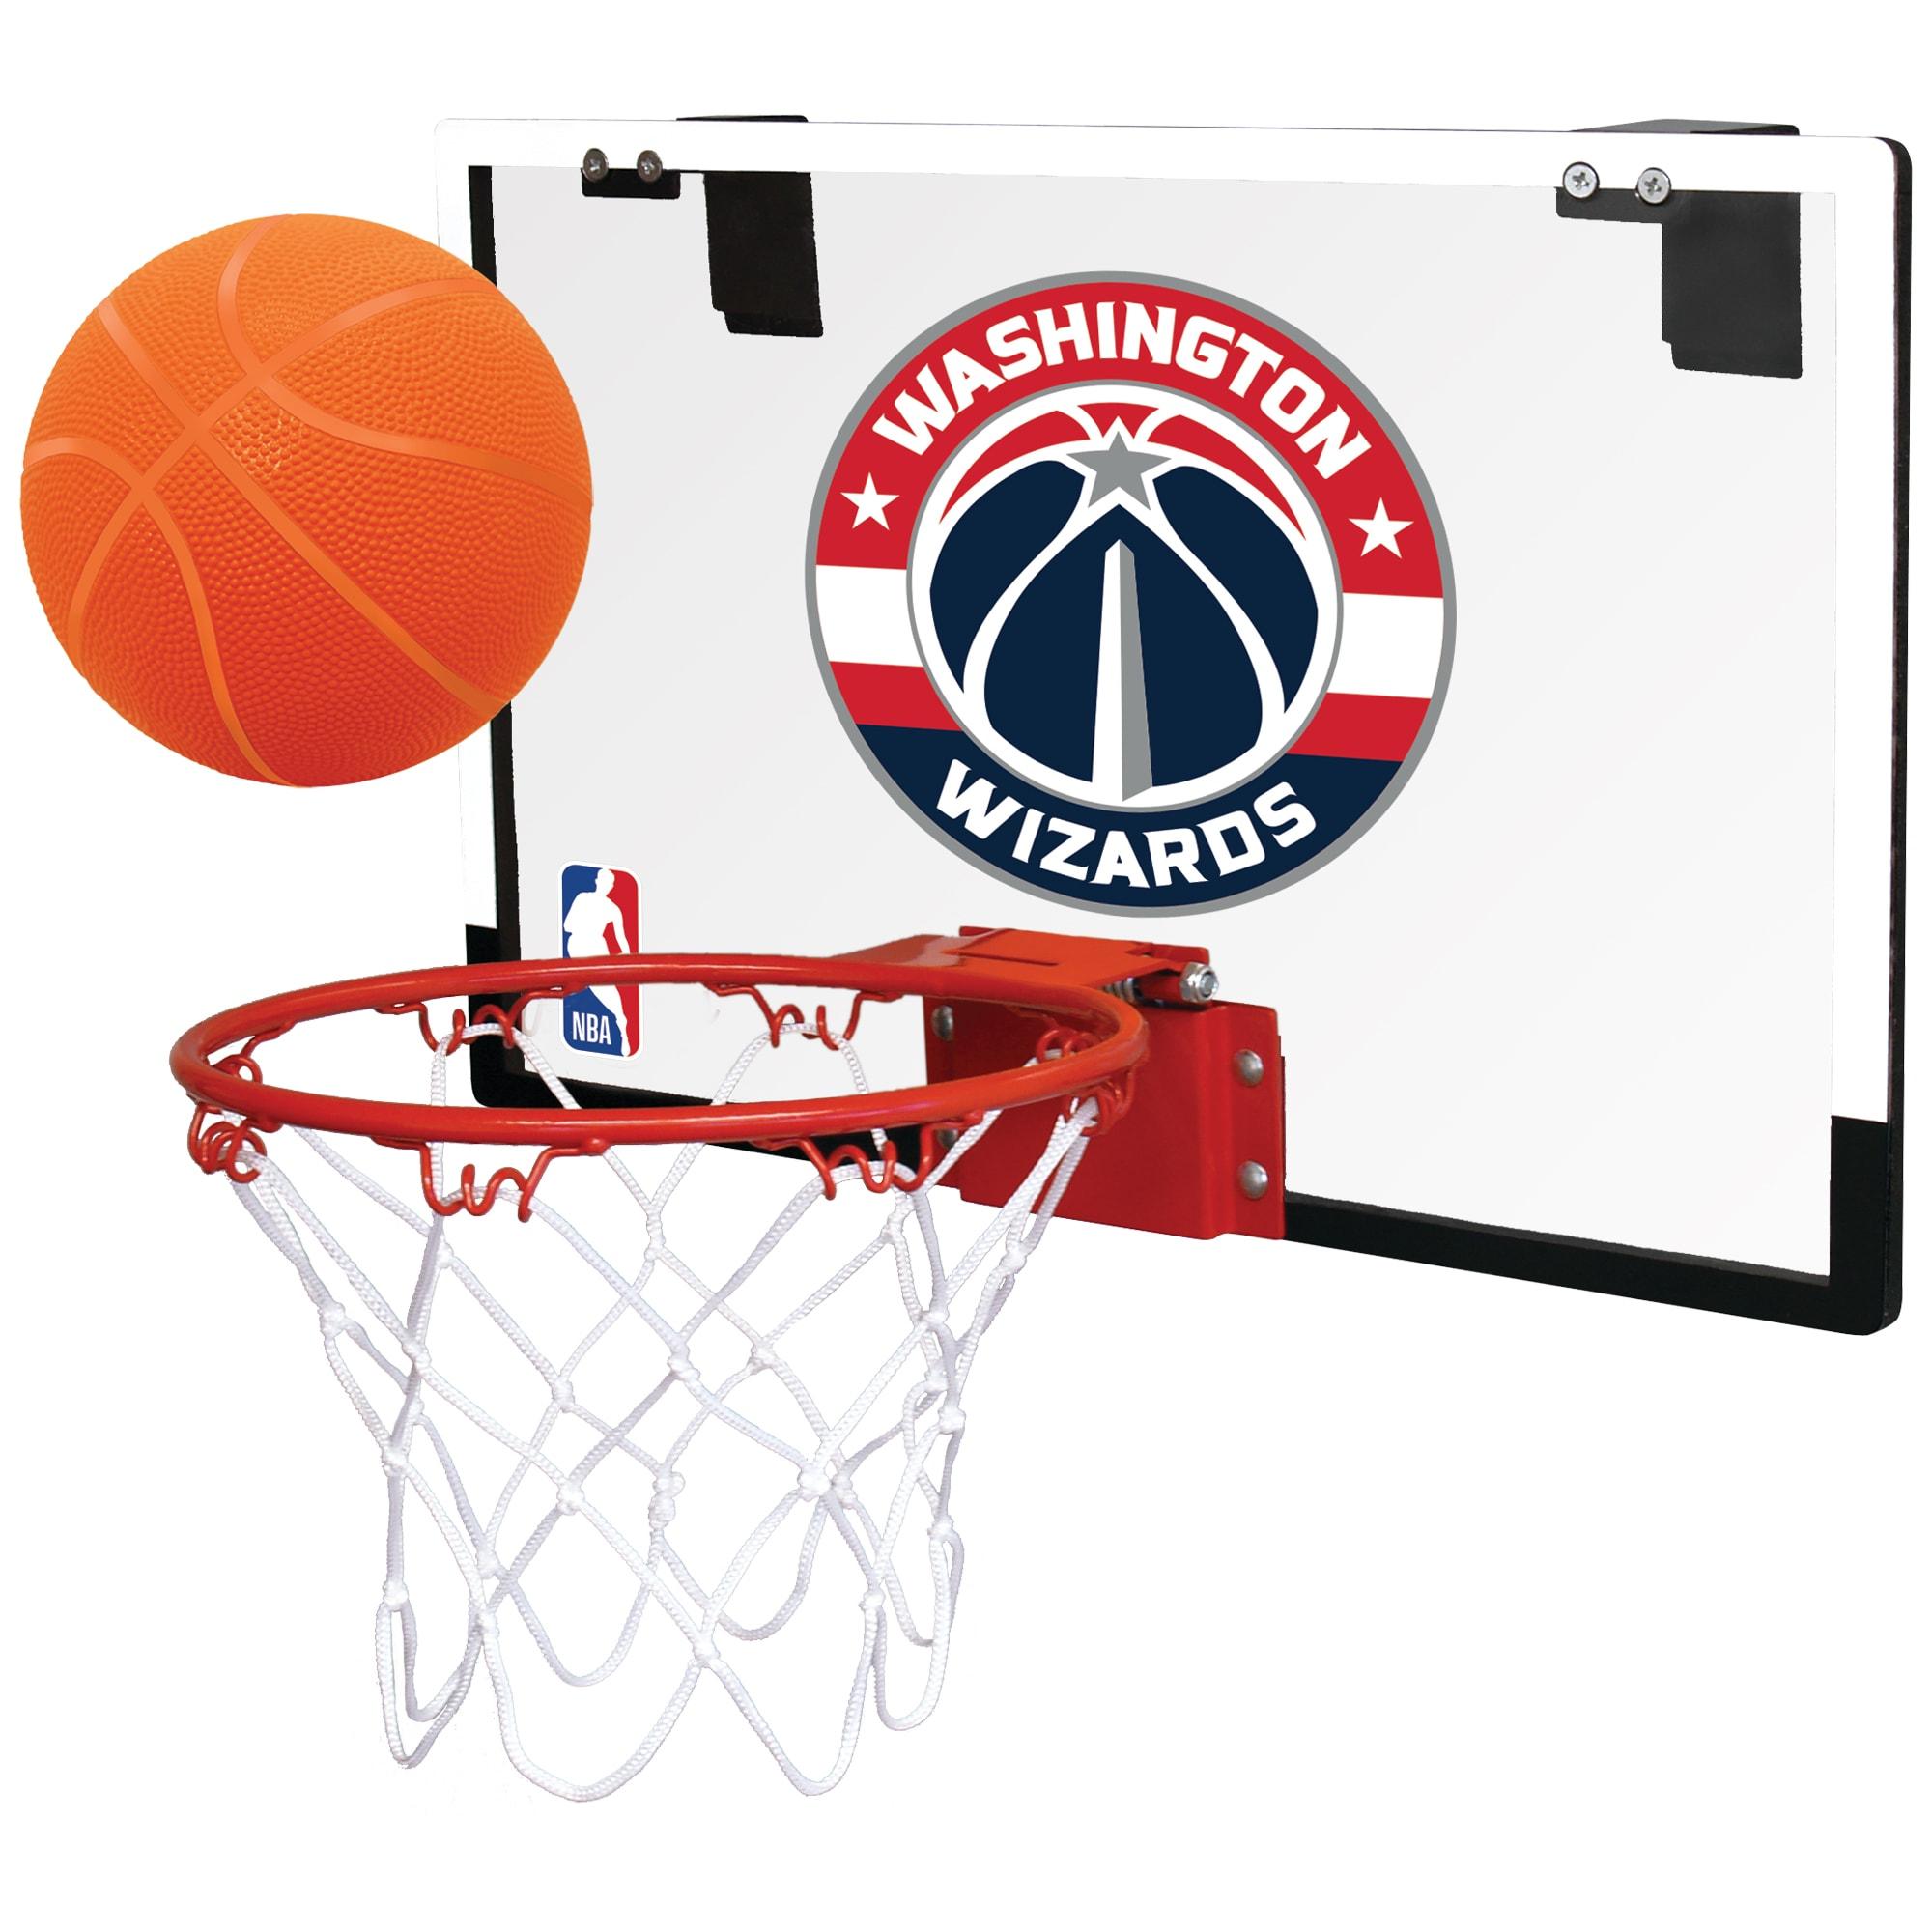 Washington Wizards Rawlings NBA Polycarbonate Hoop Set